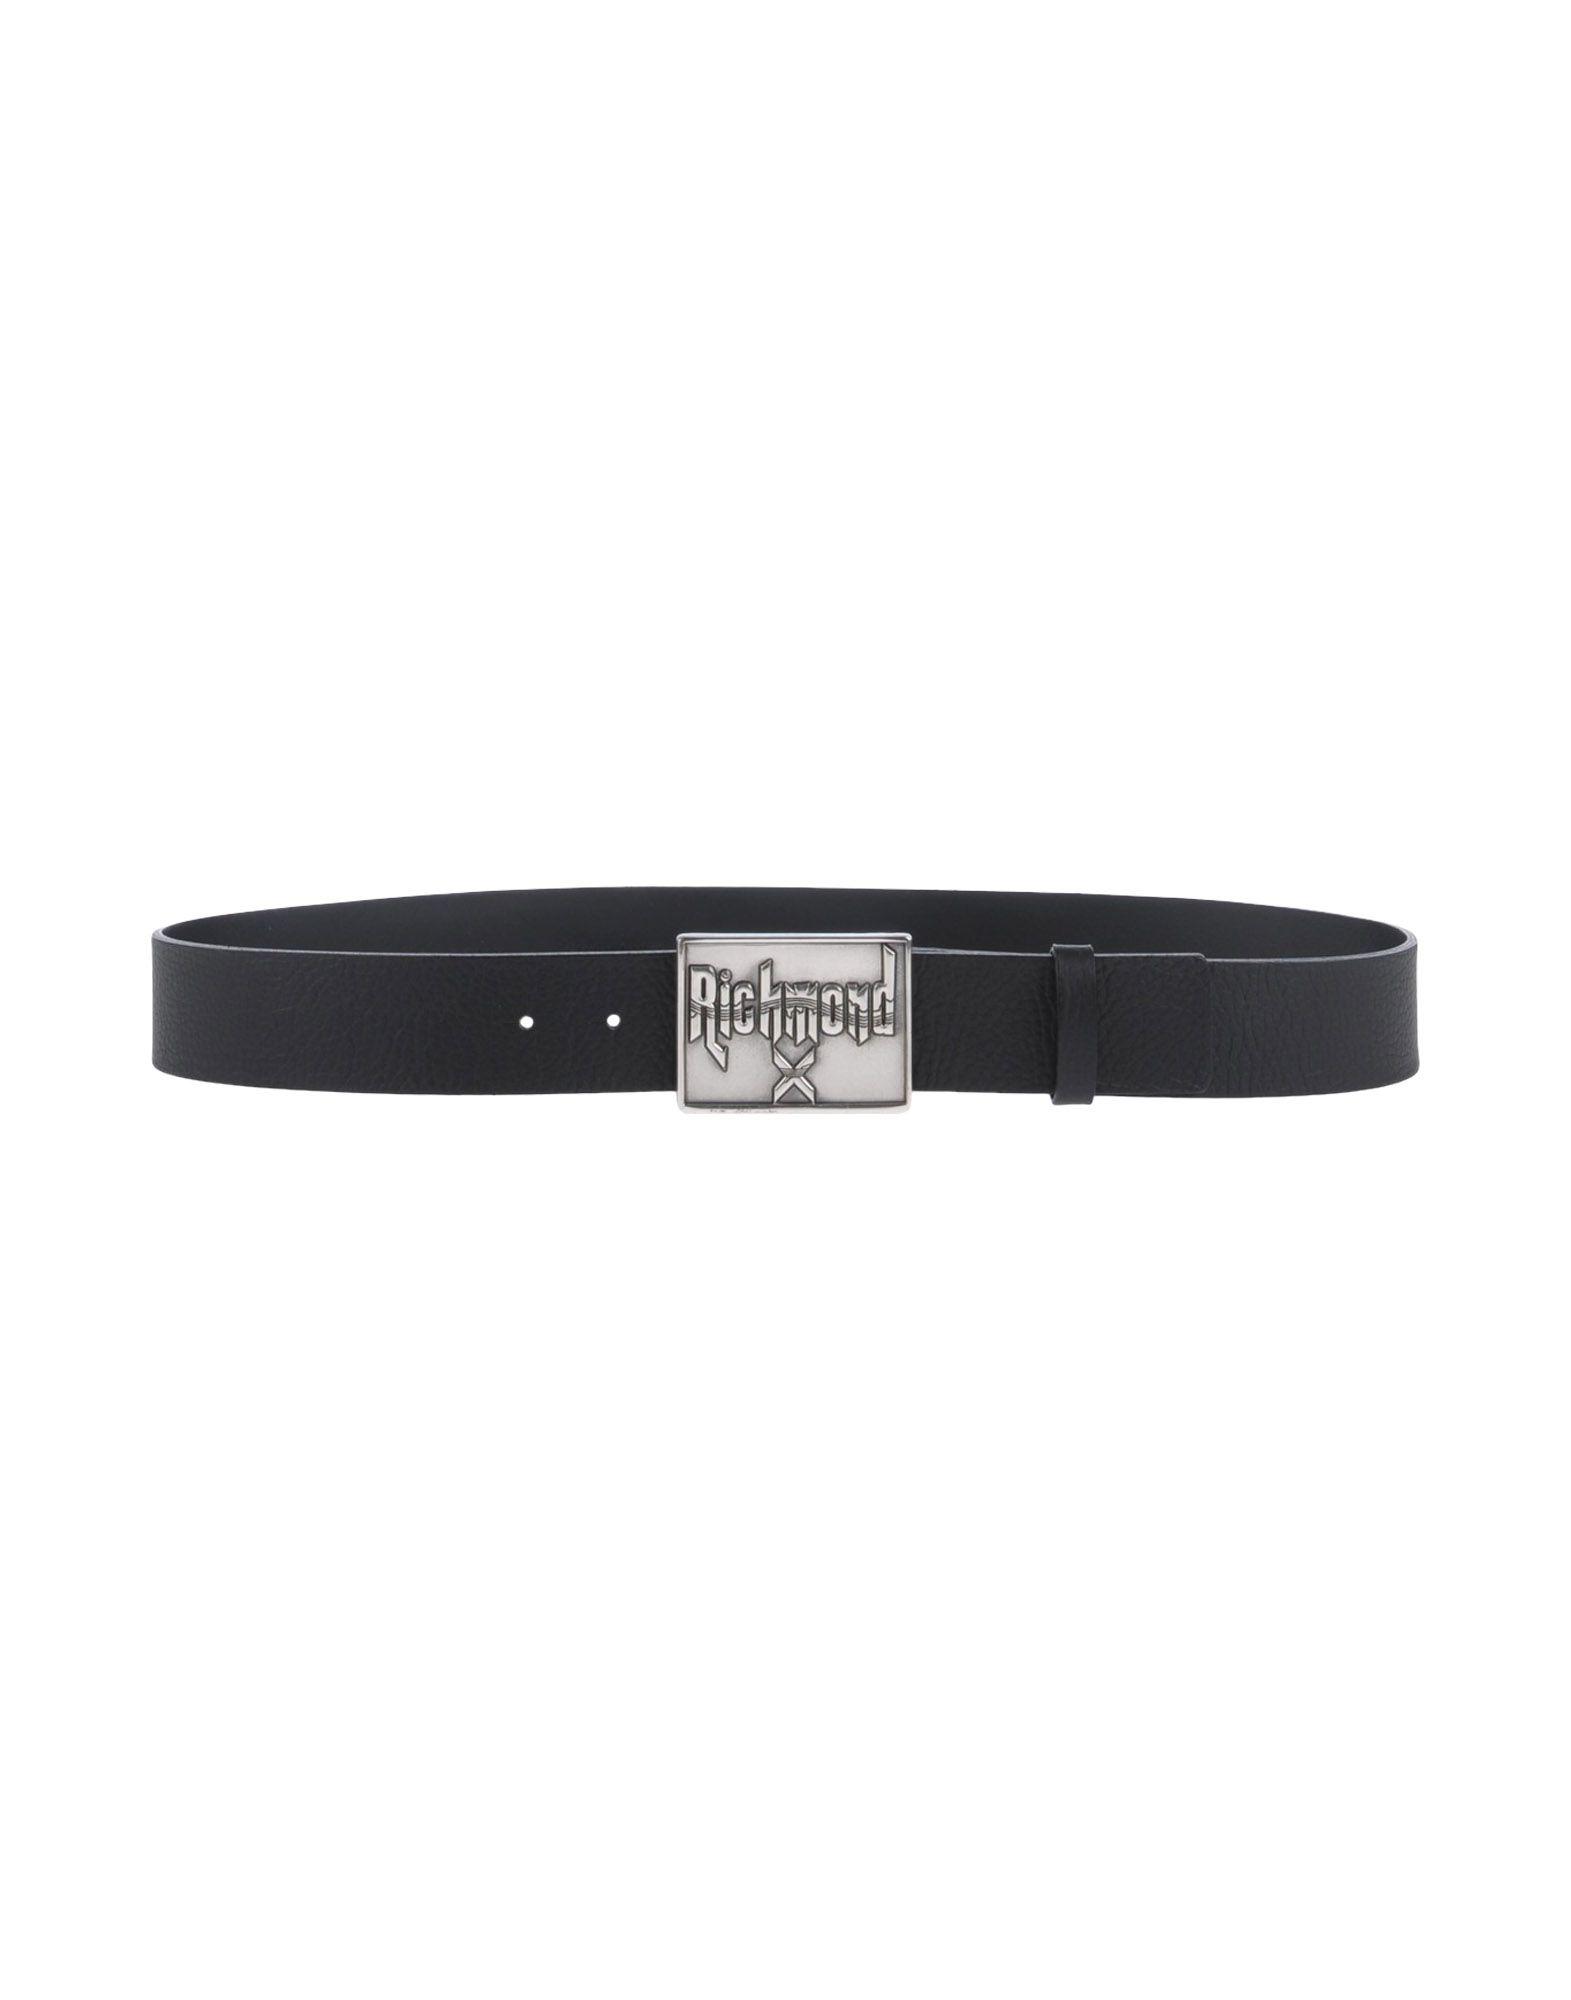 Cintura In Pelle John Richmond Uomo - Acquista online su